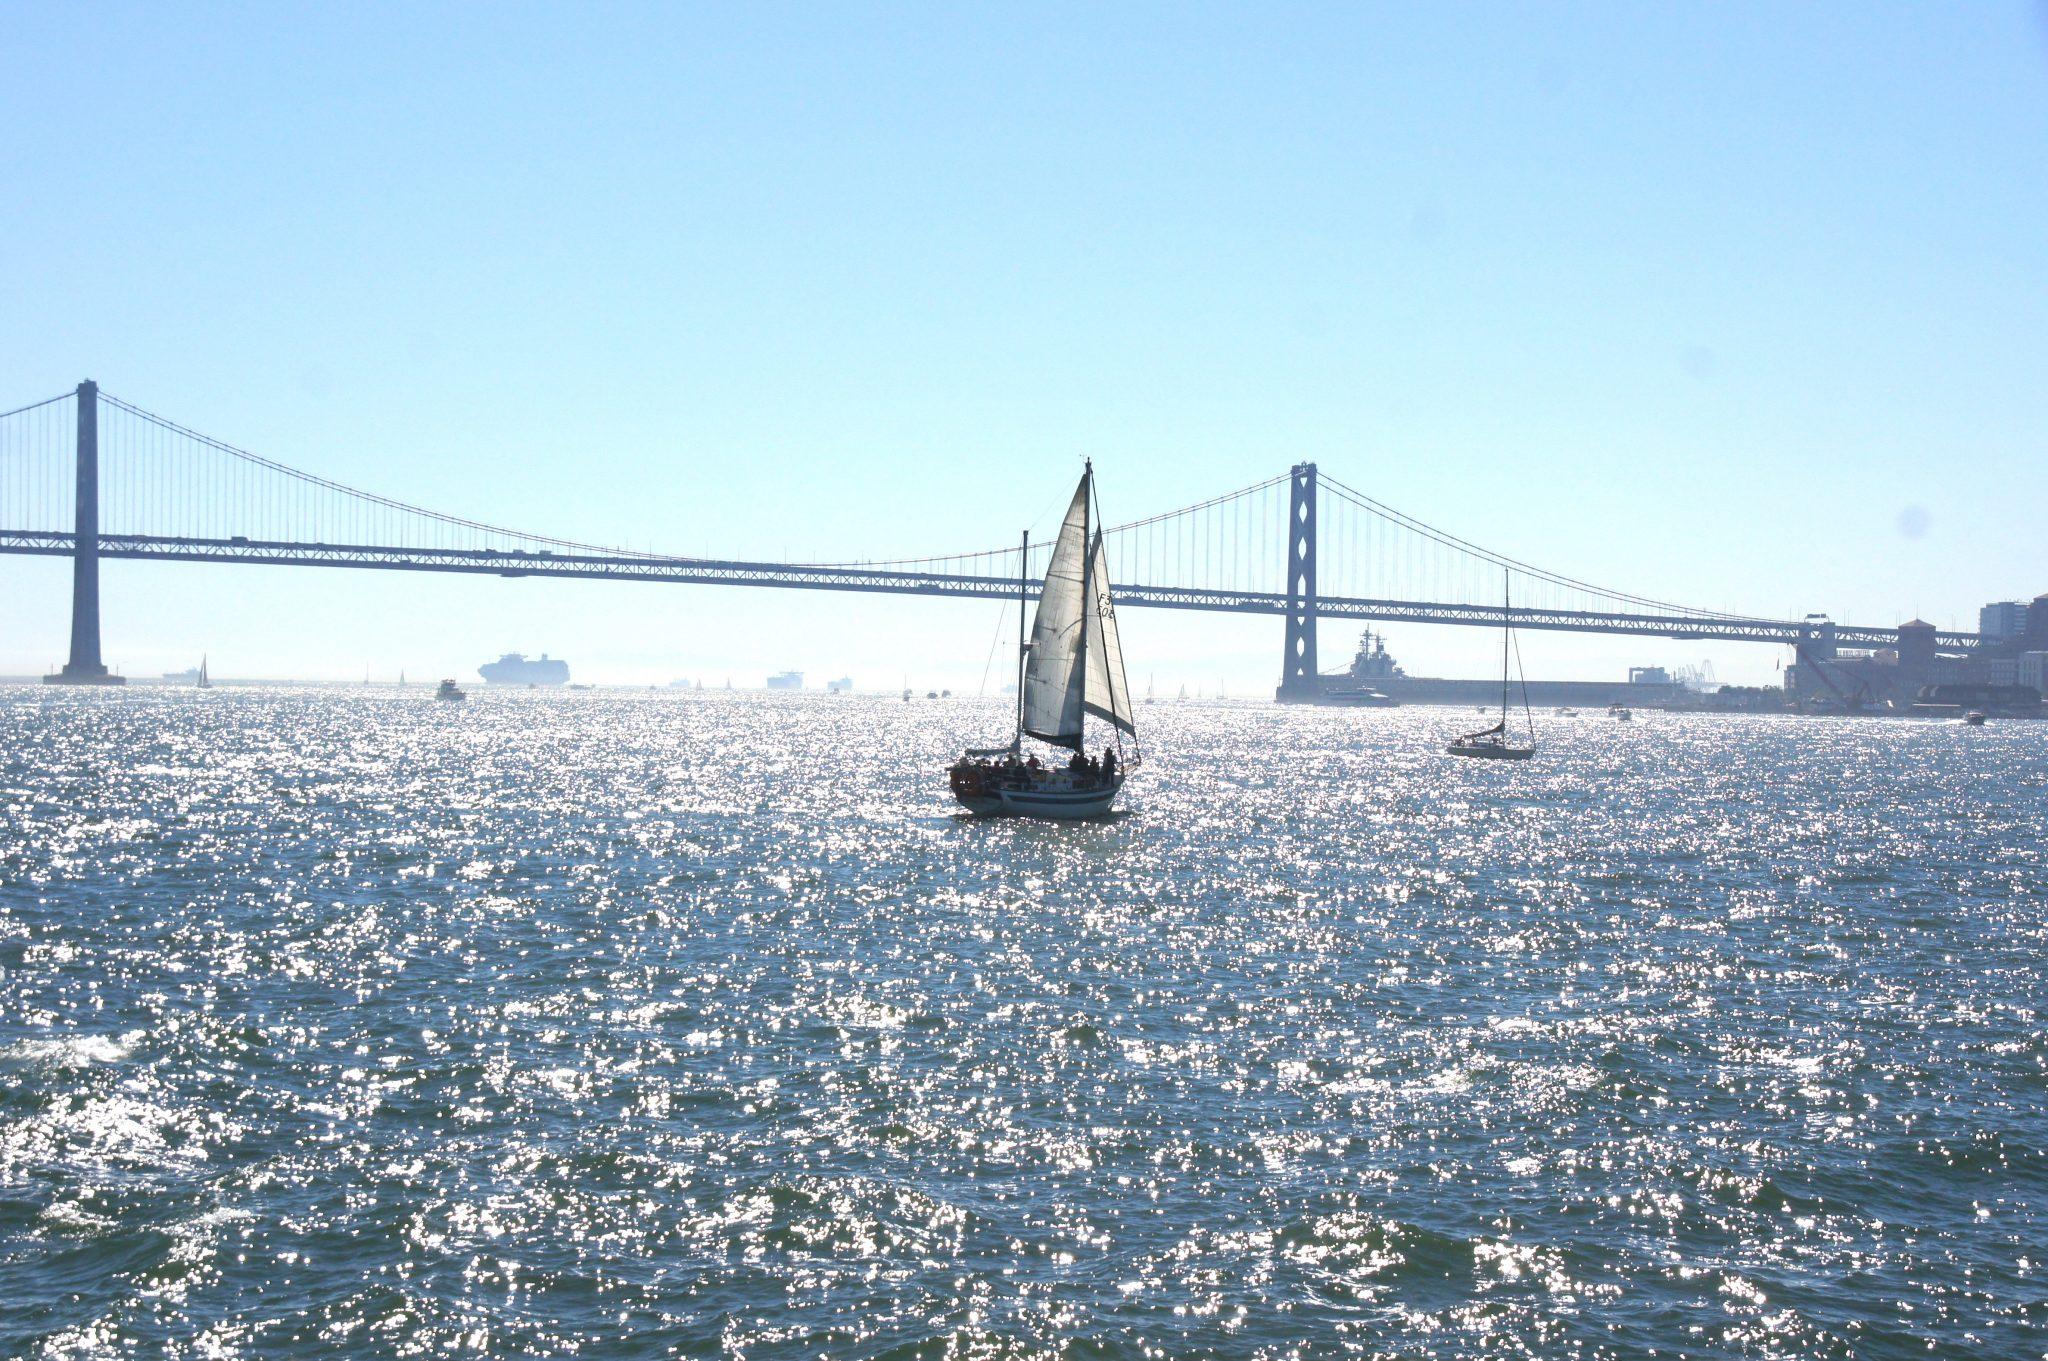 Baybrige with sailboat